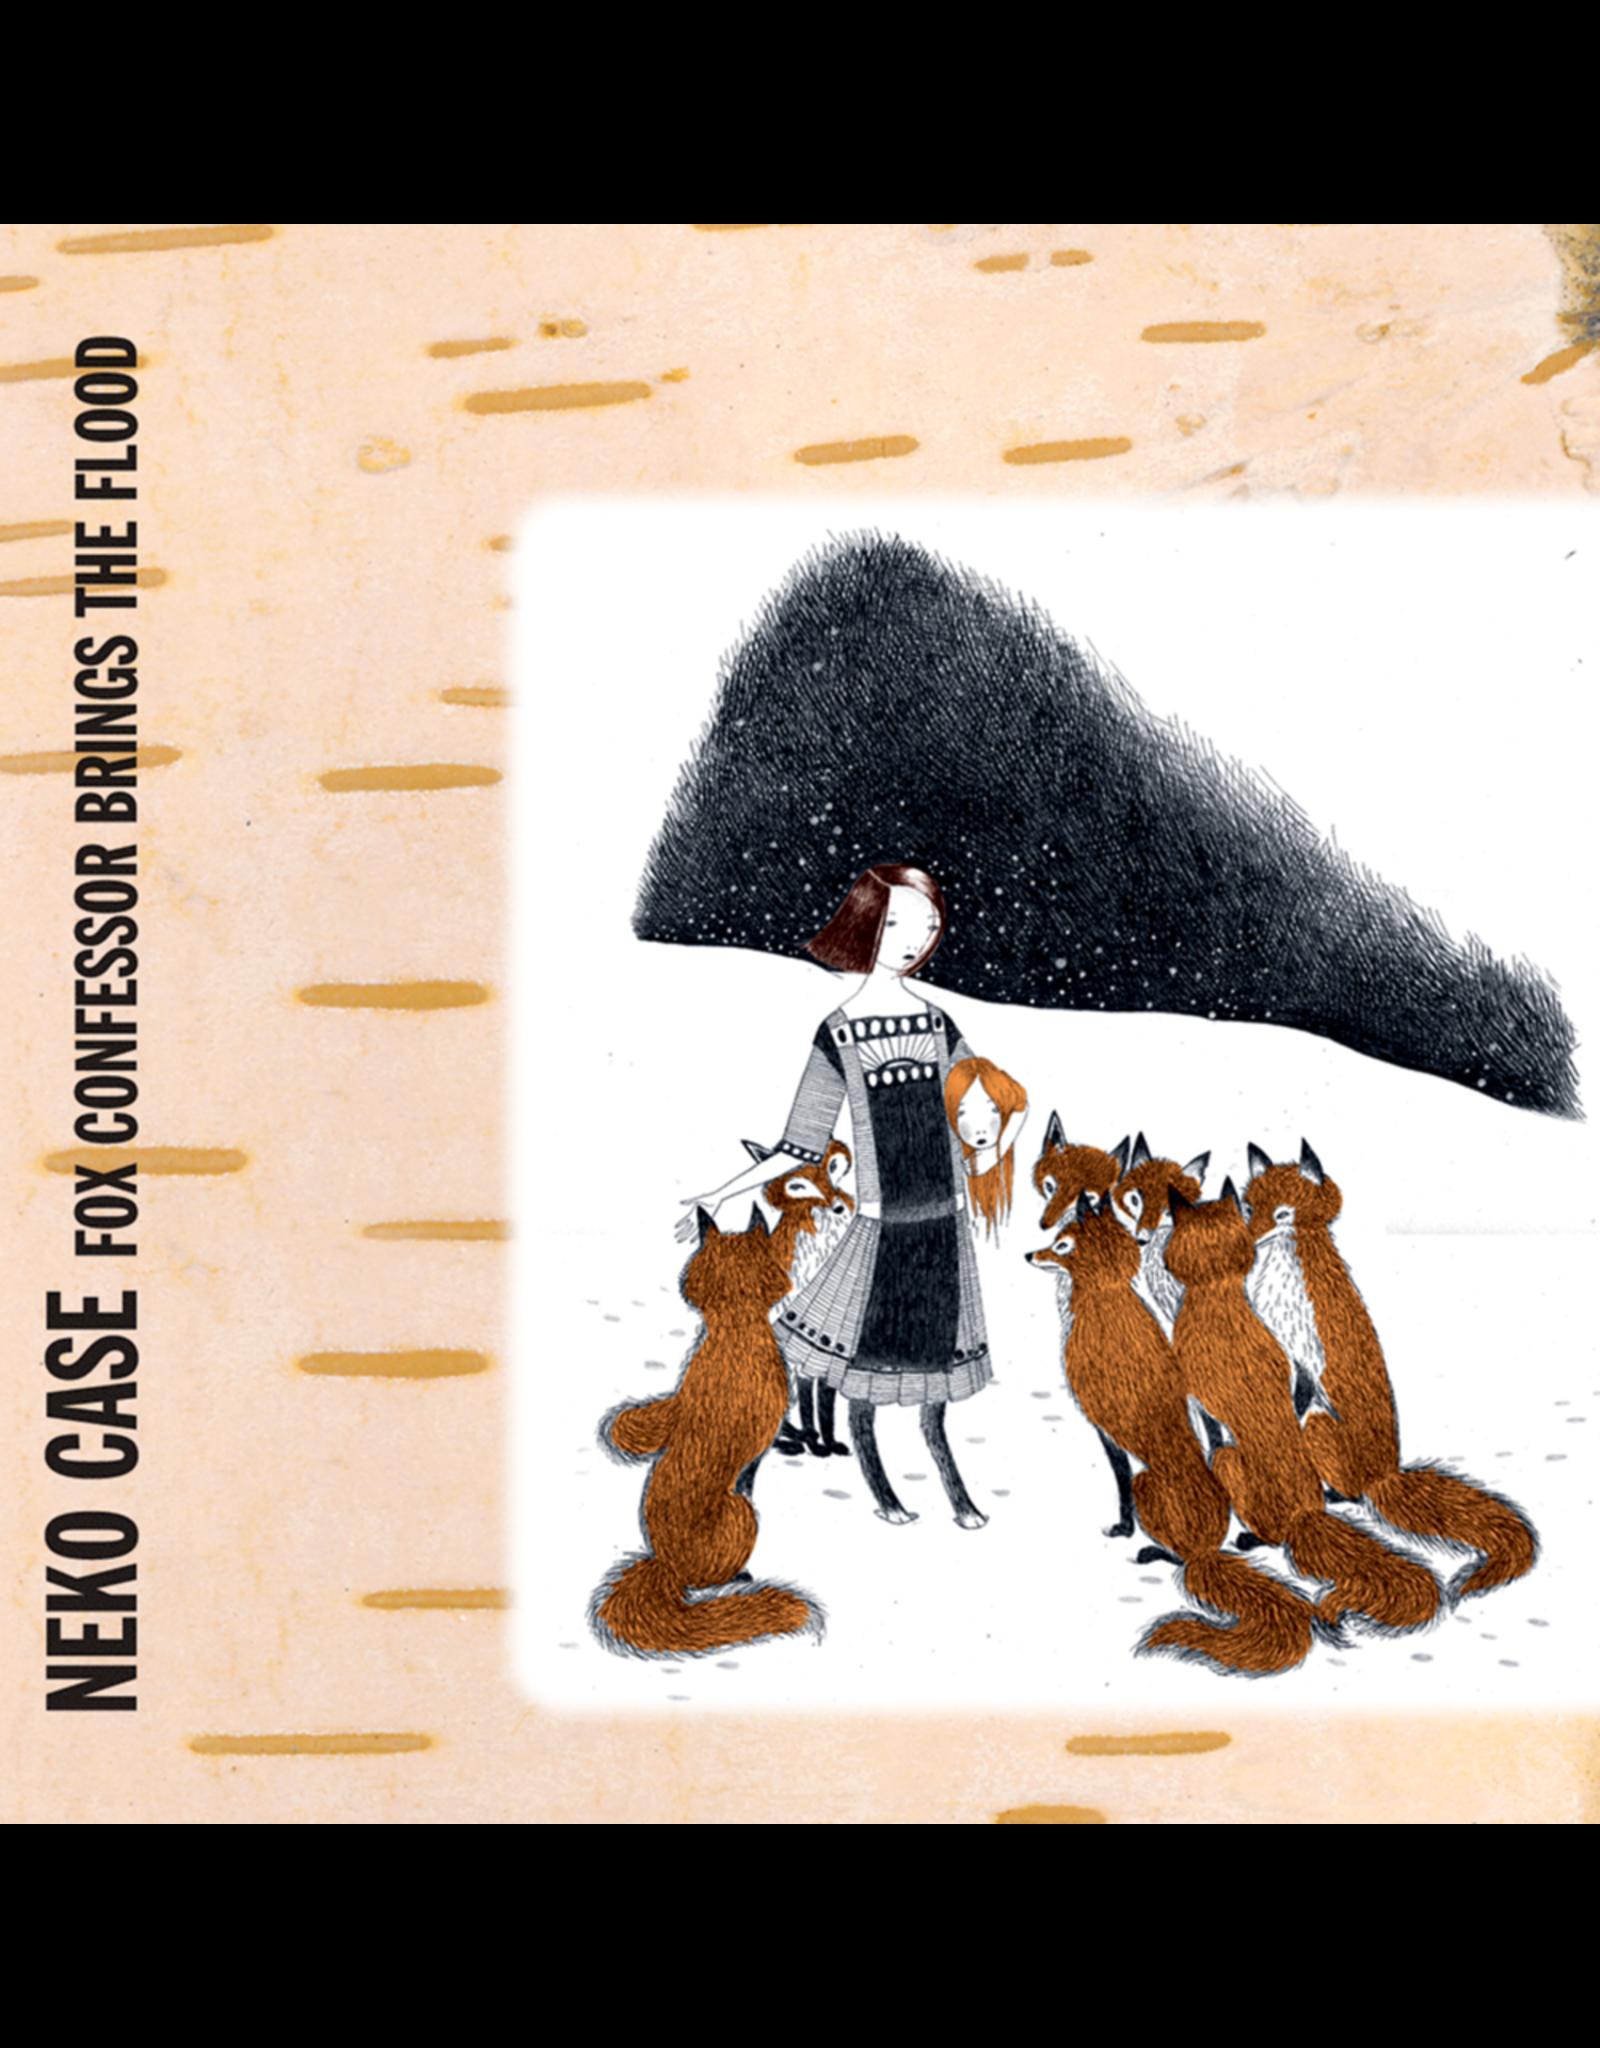 Neko Case - Fox Confessor Brings The Flood